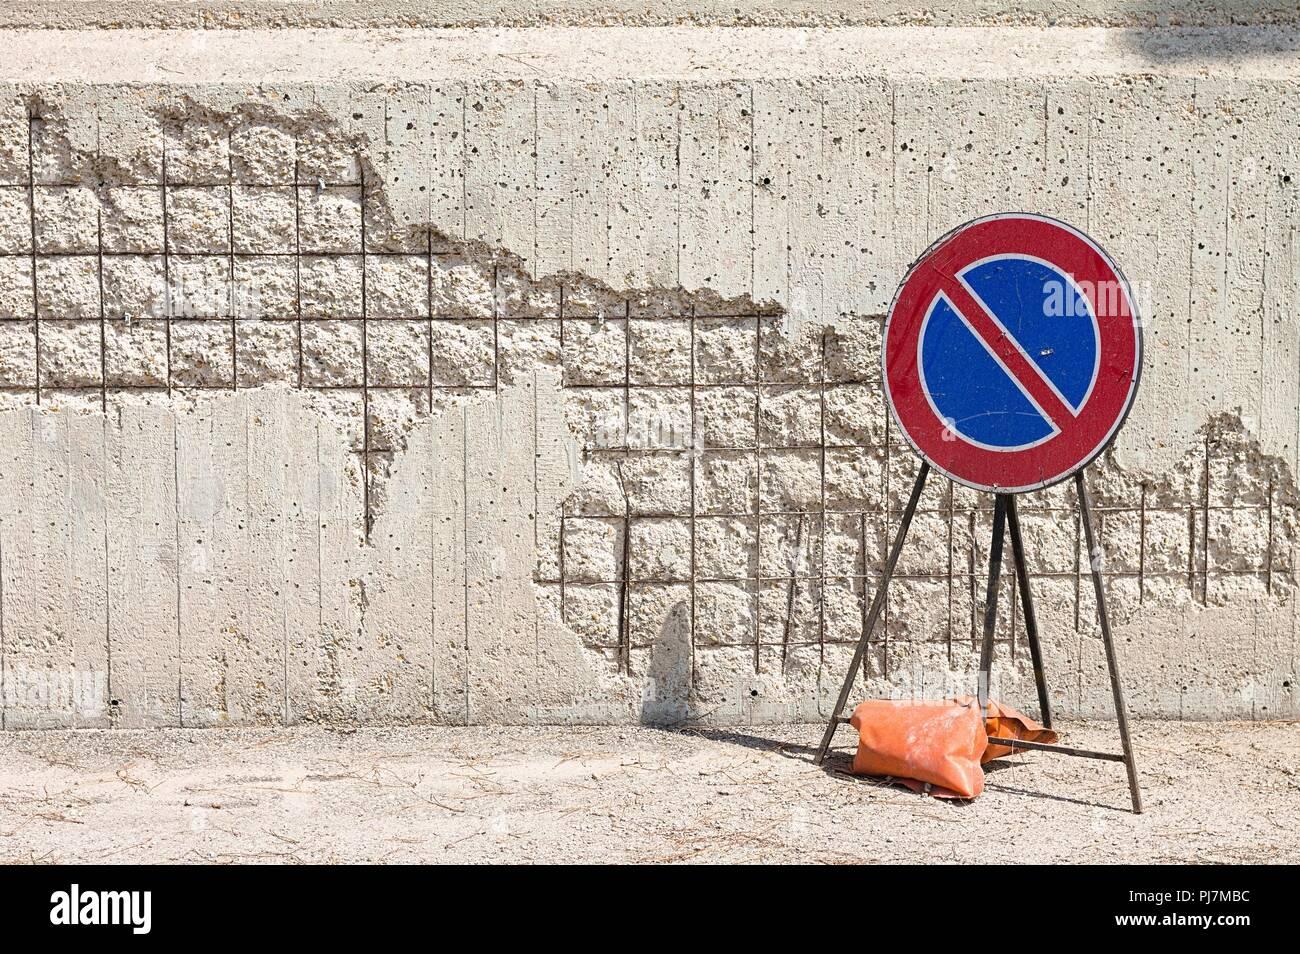 No parking - Work in progress (Pesaro, Italy, Europe) - Stock Image